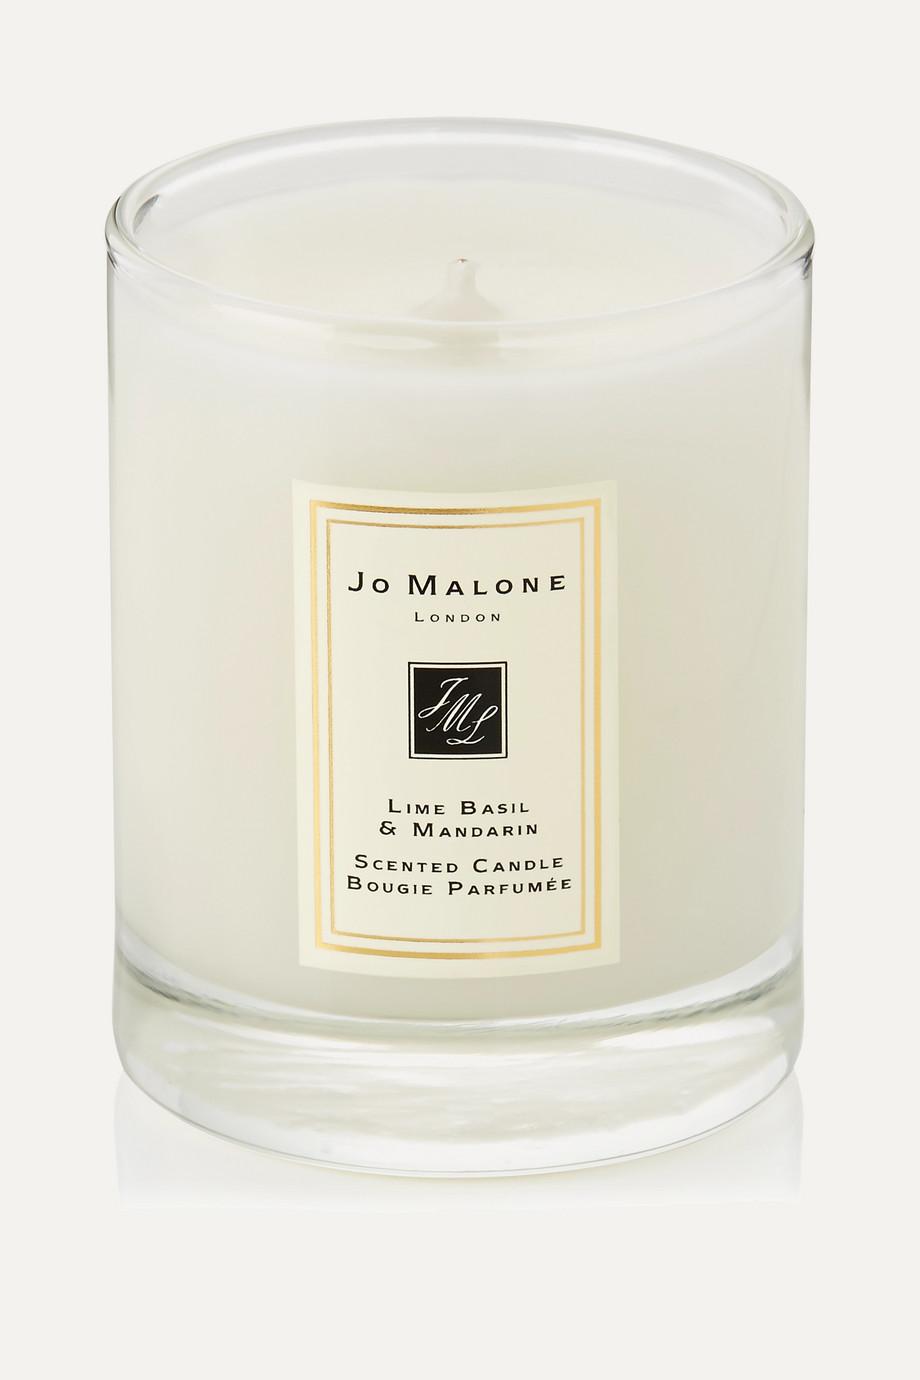 Jo Malone London Lime Basil & Mandarin Scented Travel Candle, 60g